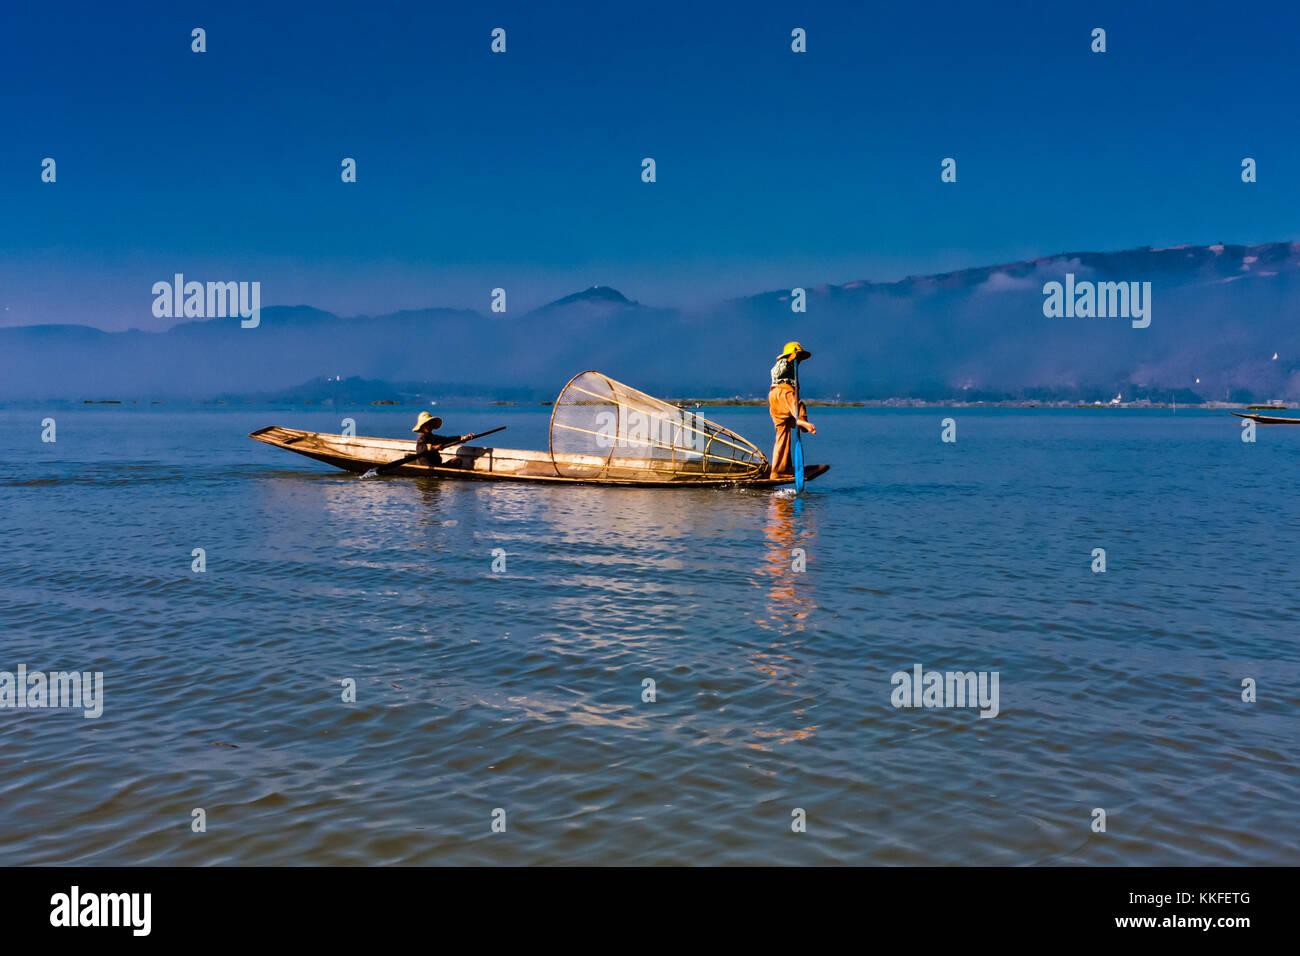 Iconic fishermen on the Inle Lake, Taunggyi, Myanmar Stock Photo